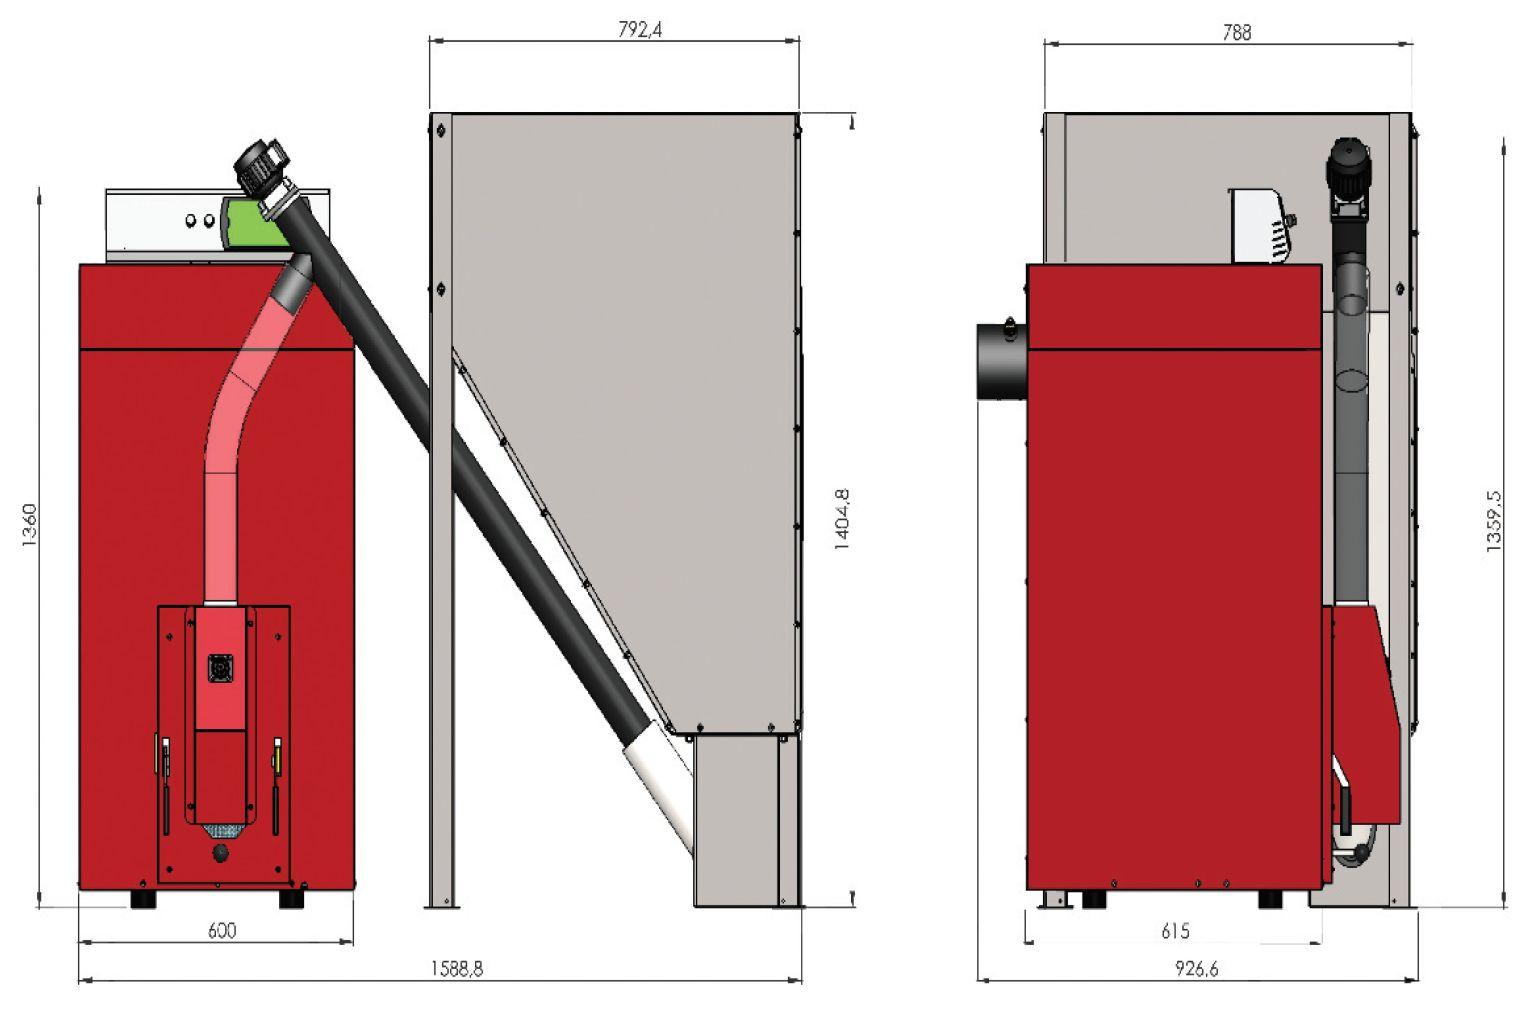 Kessel für Pellet Orligno 400 - 30 kW - Kessel, Heizkessel ...